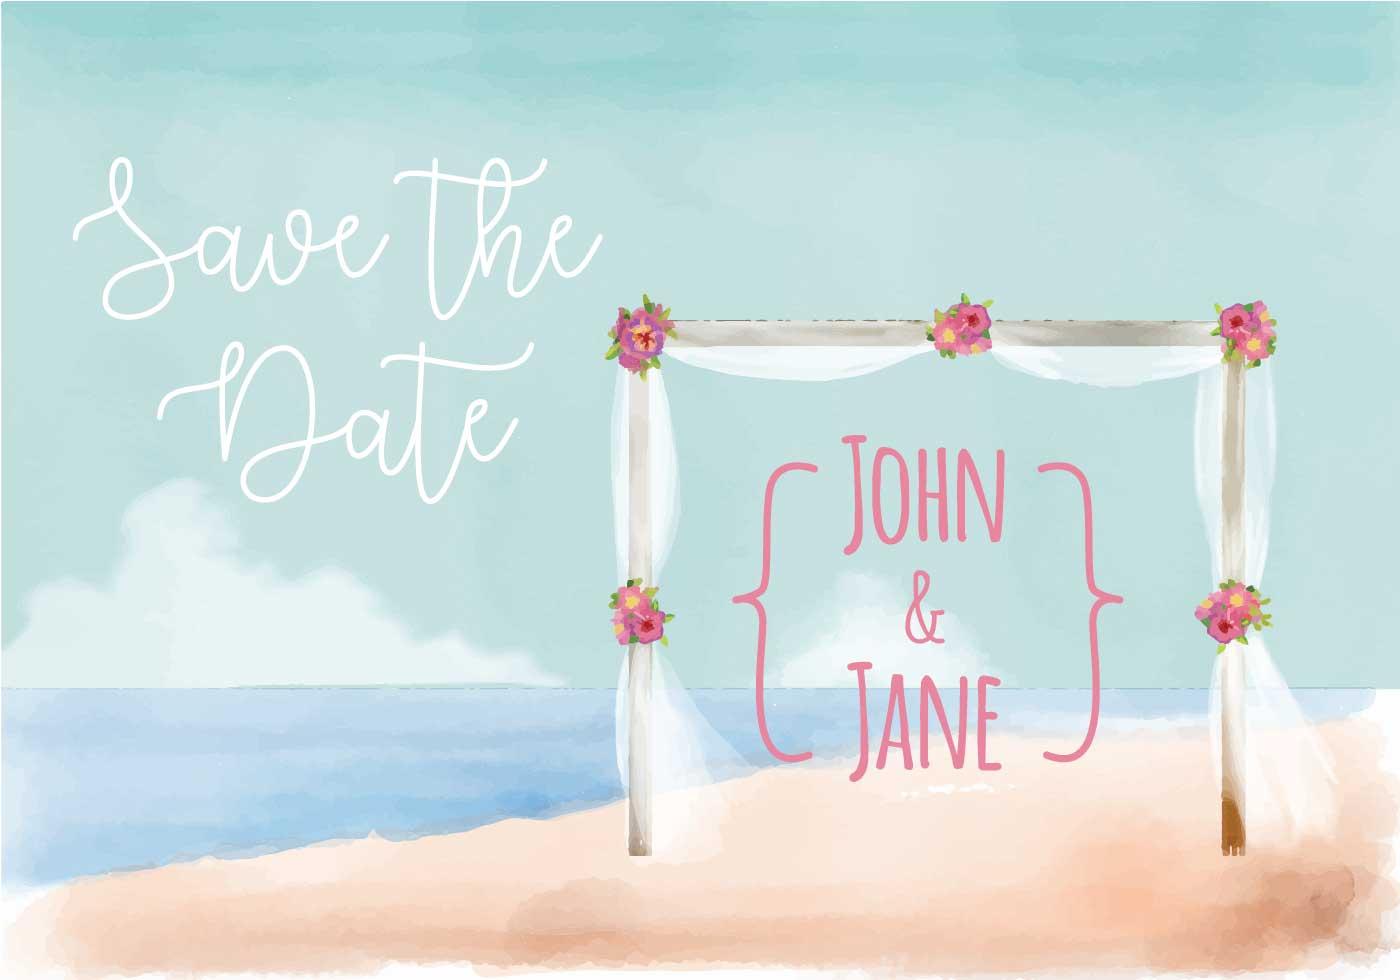 Vector Wedding Invitations: Beach Wedding Invitations Free Vector Art